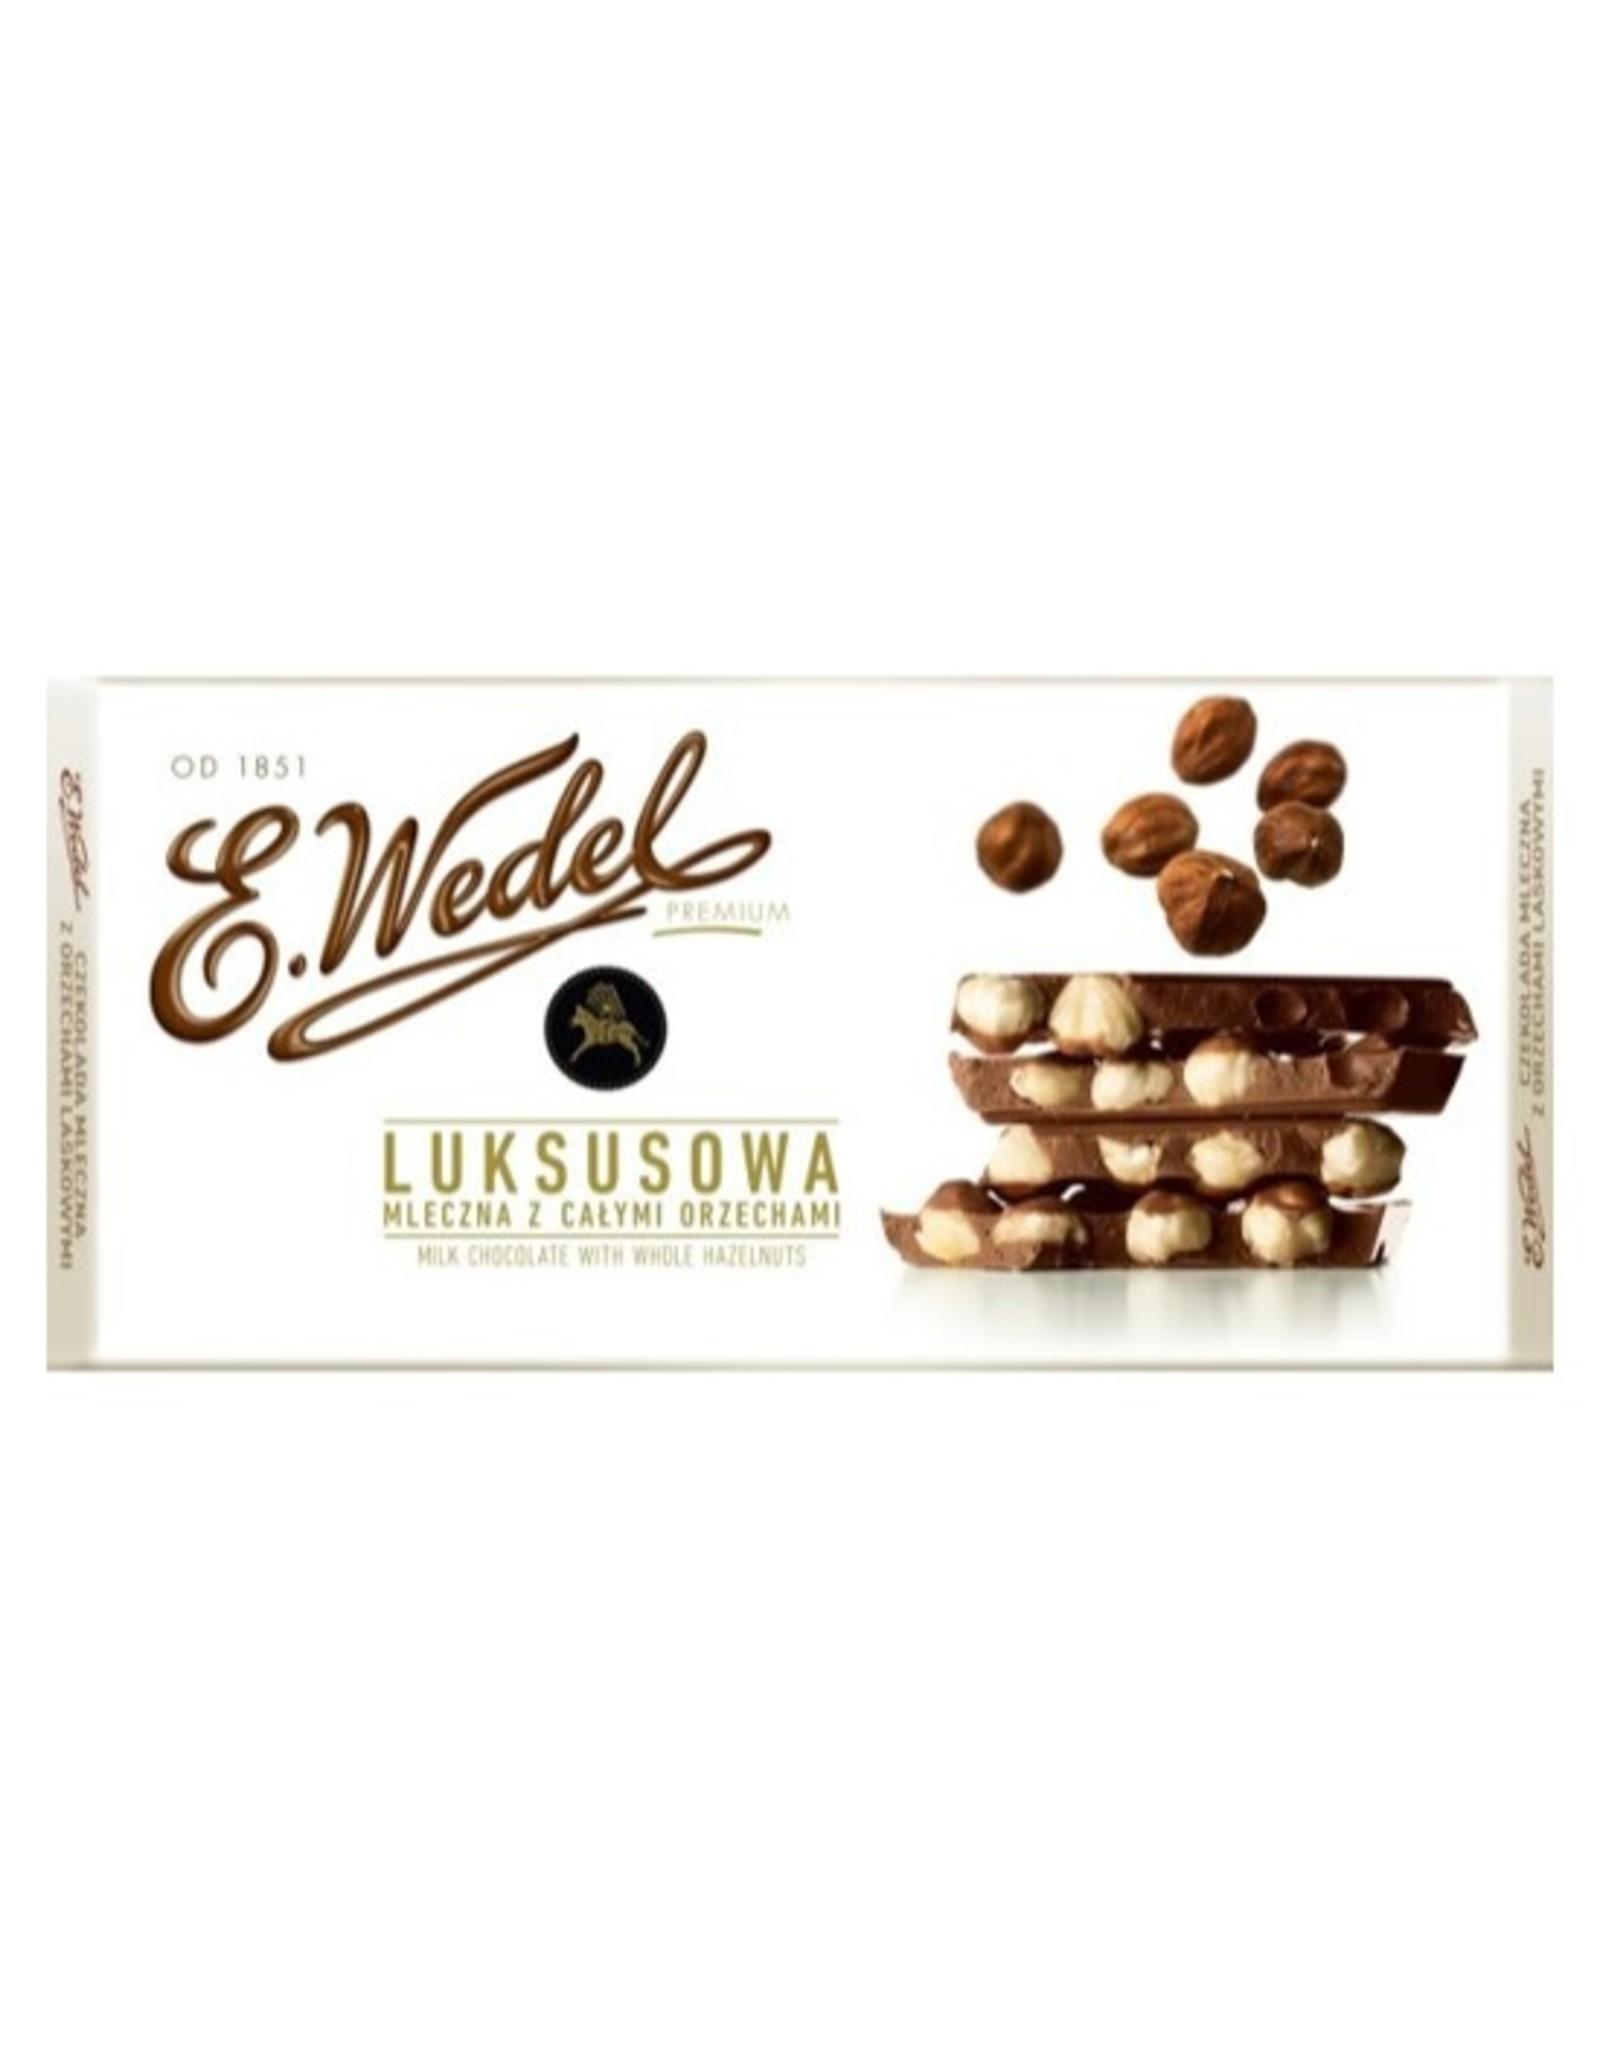 Wedel Hazelnut Milk Chocolate Bar